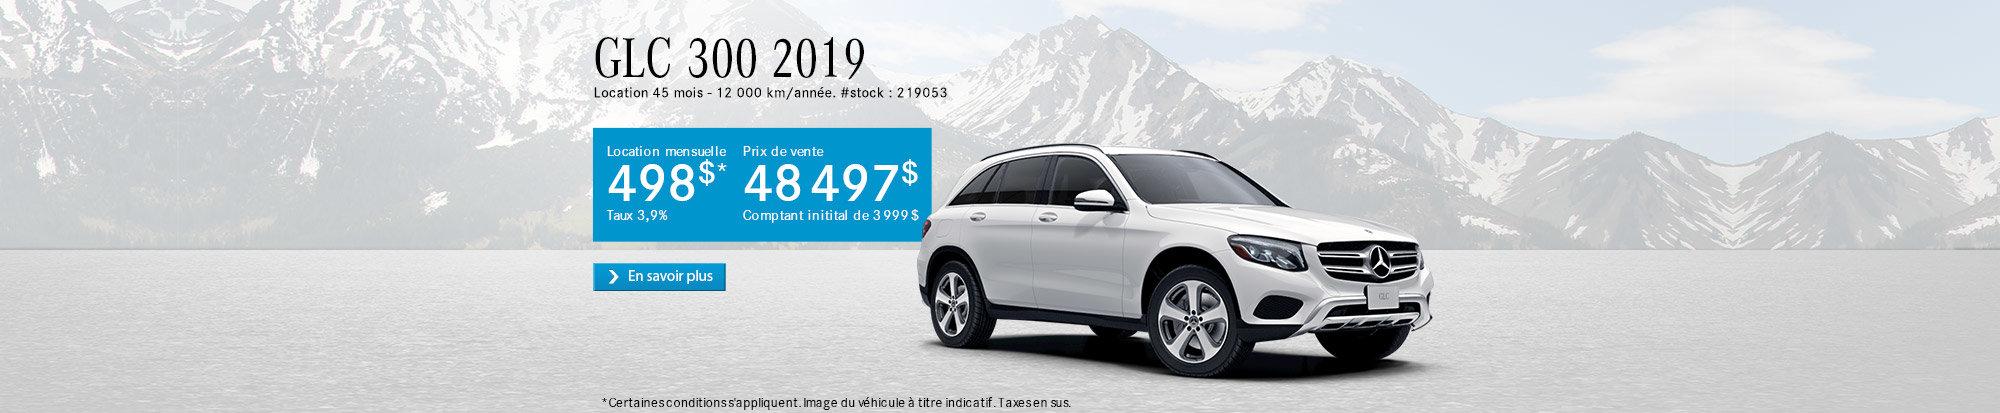 GLC 300 2018 - web